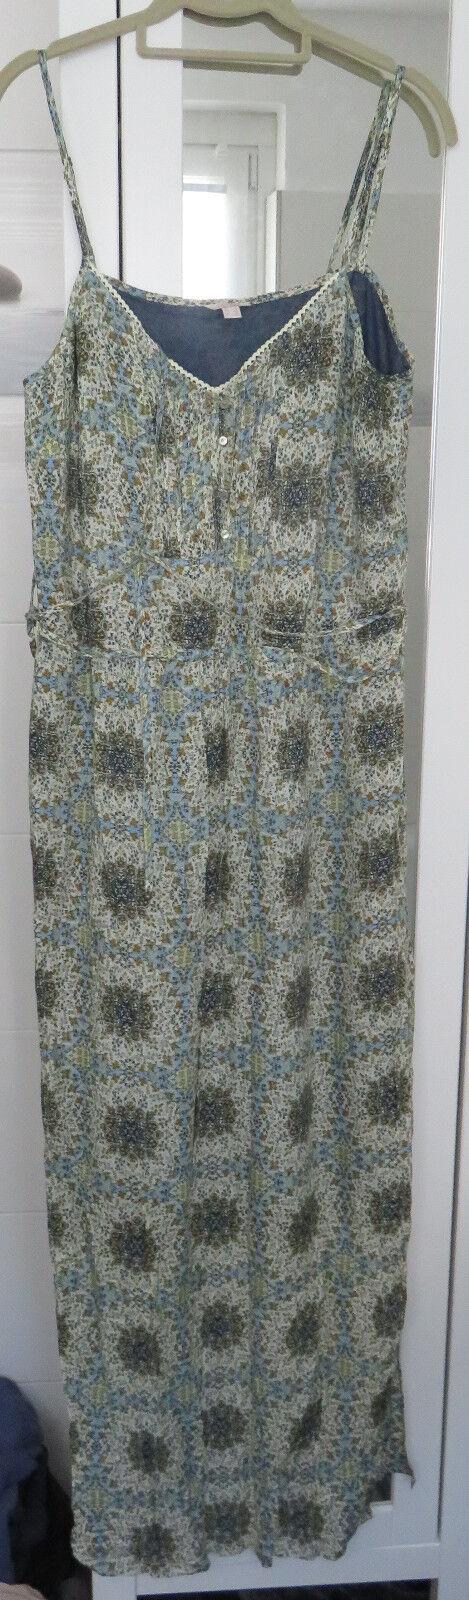 Esprit Kleid, Sommerkleid, Gr. 42